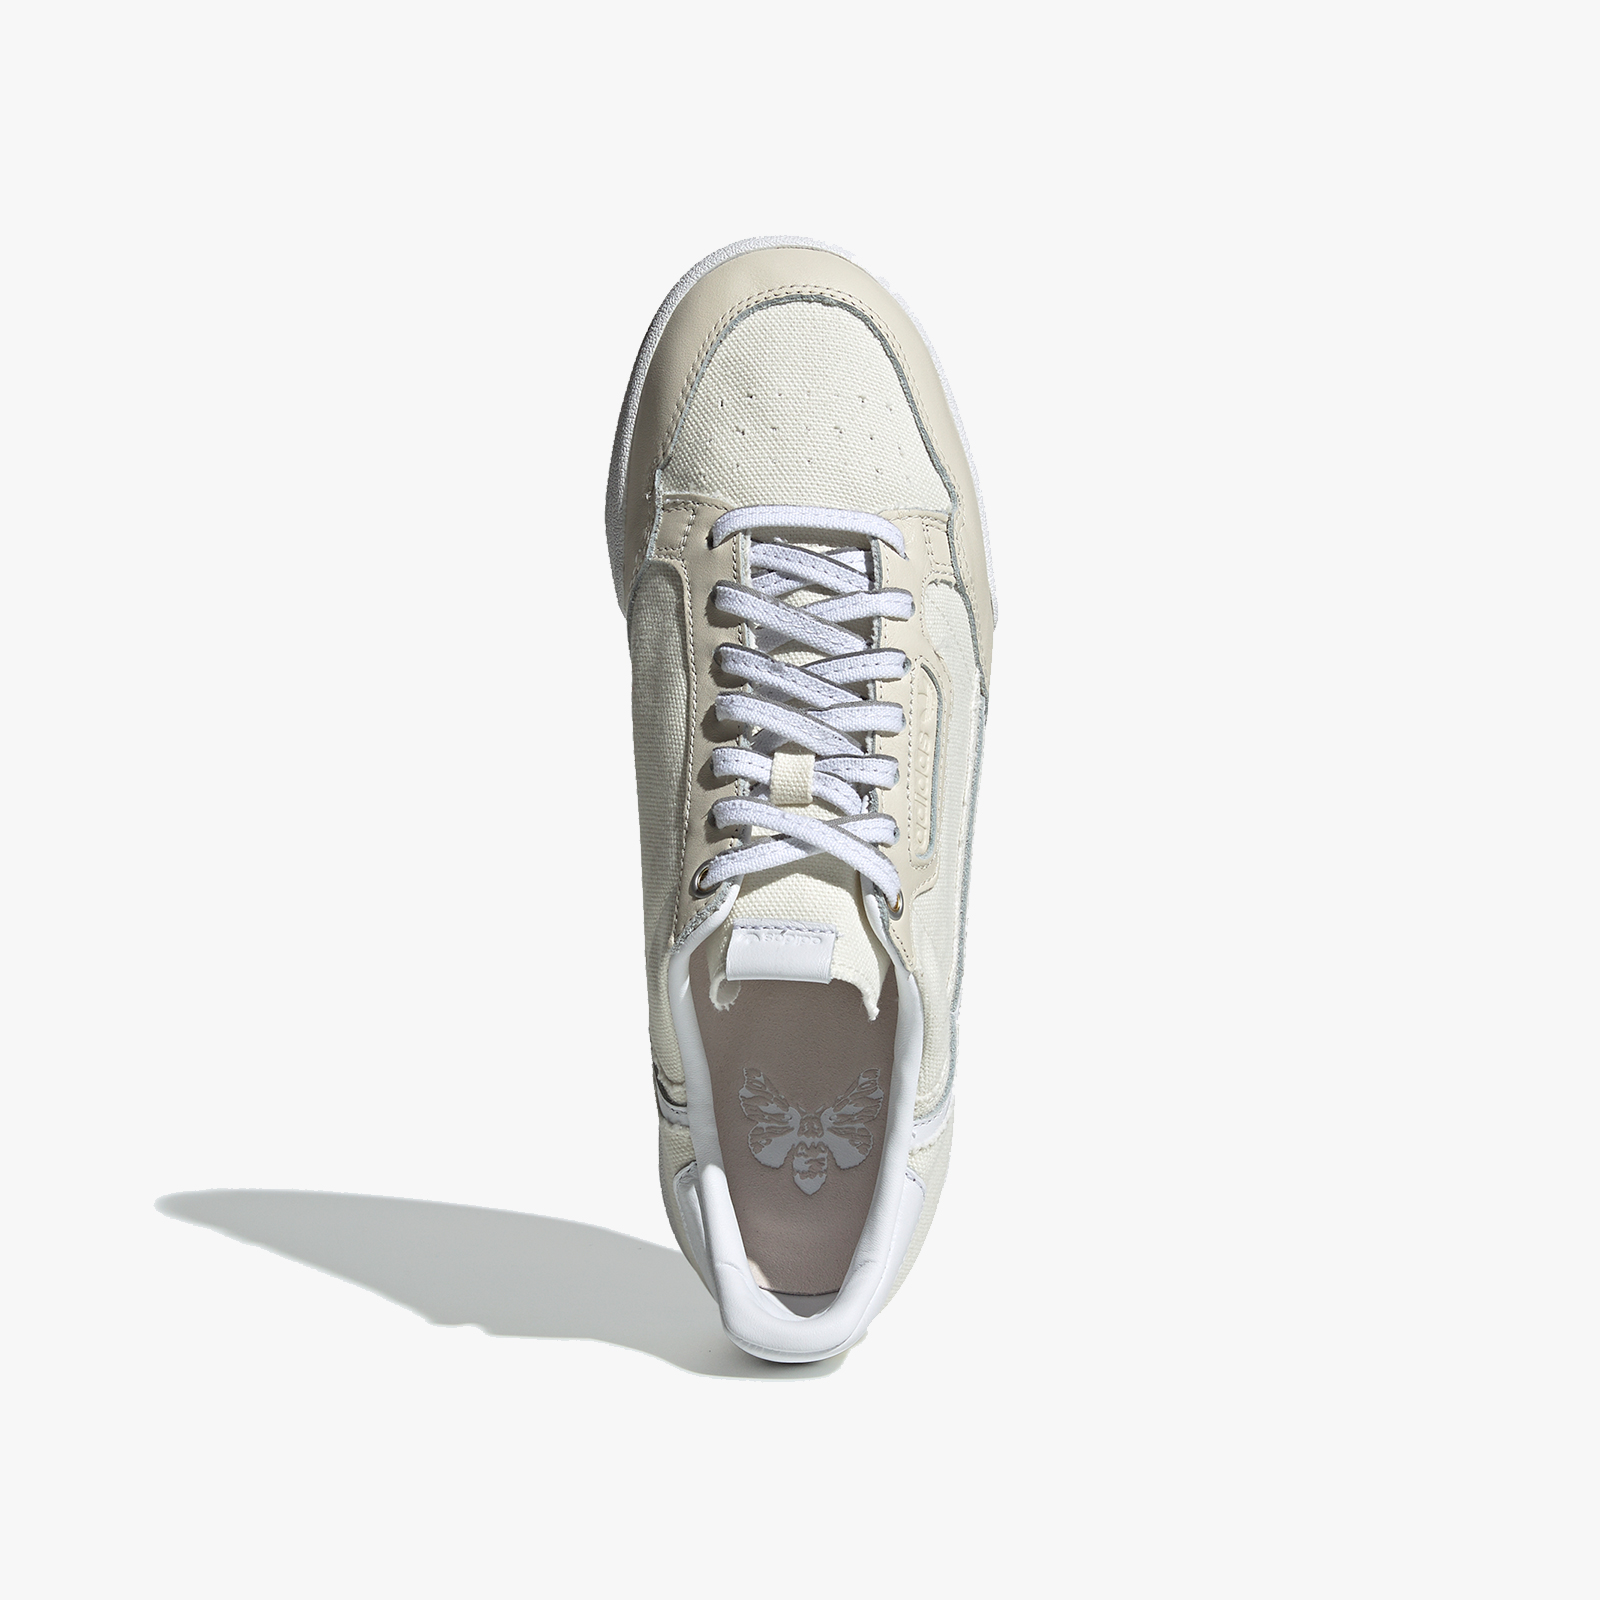 adidas Continental 80 x Donald Glover